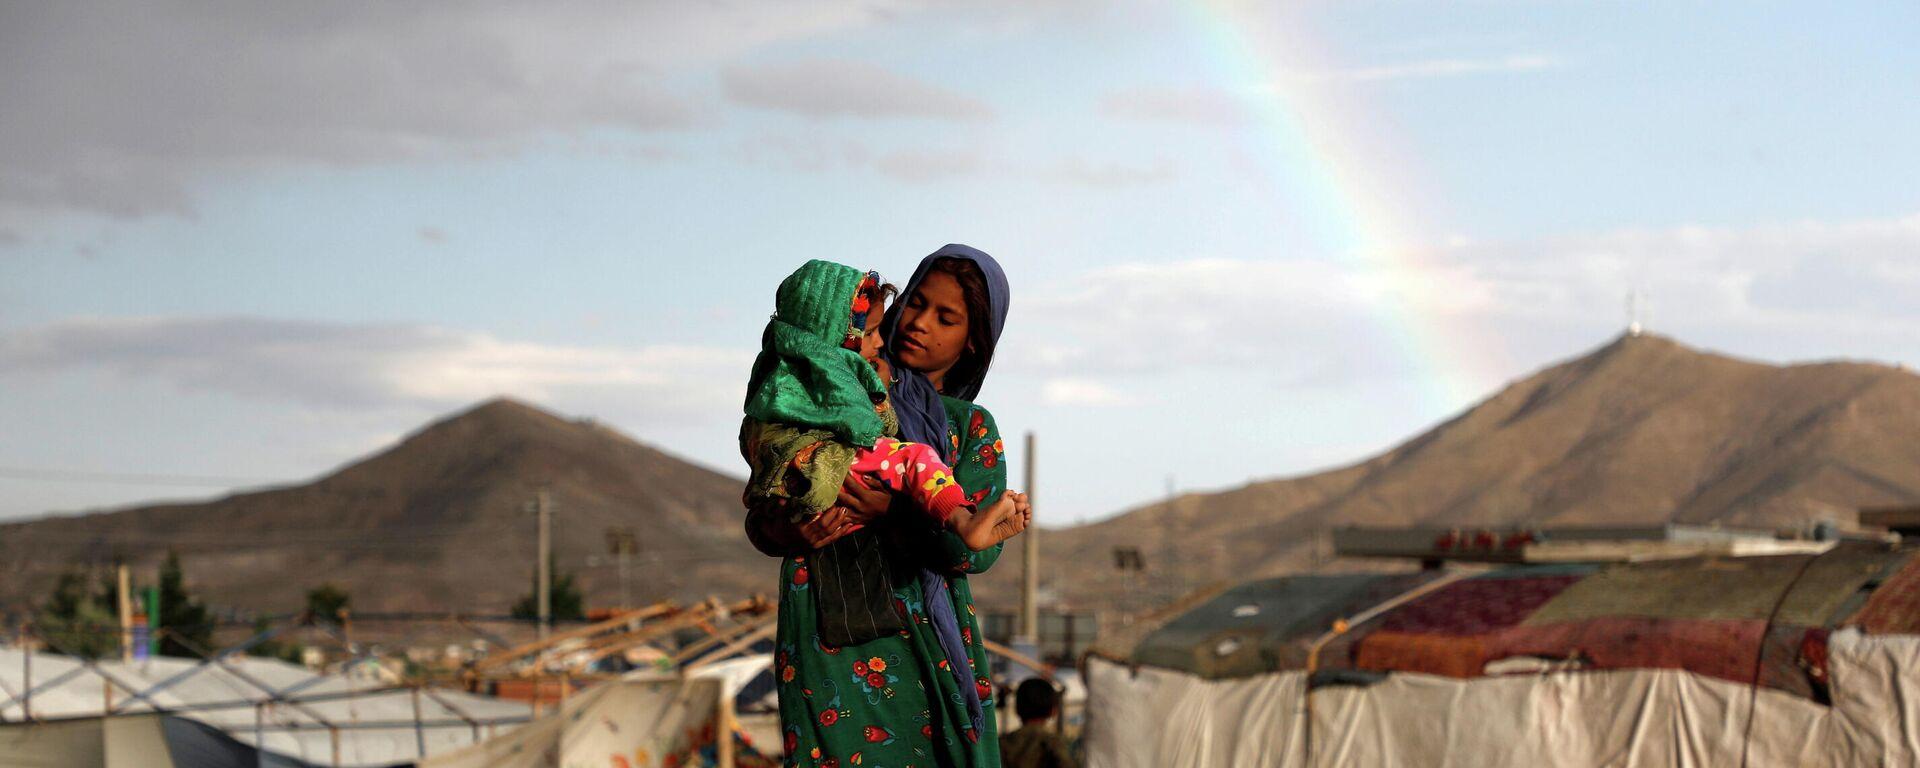 Afghanistan - SNA, 1920, 23.07.2021